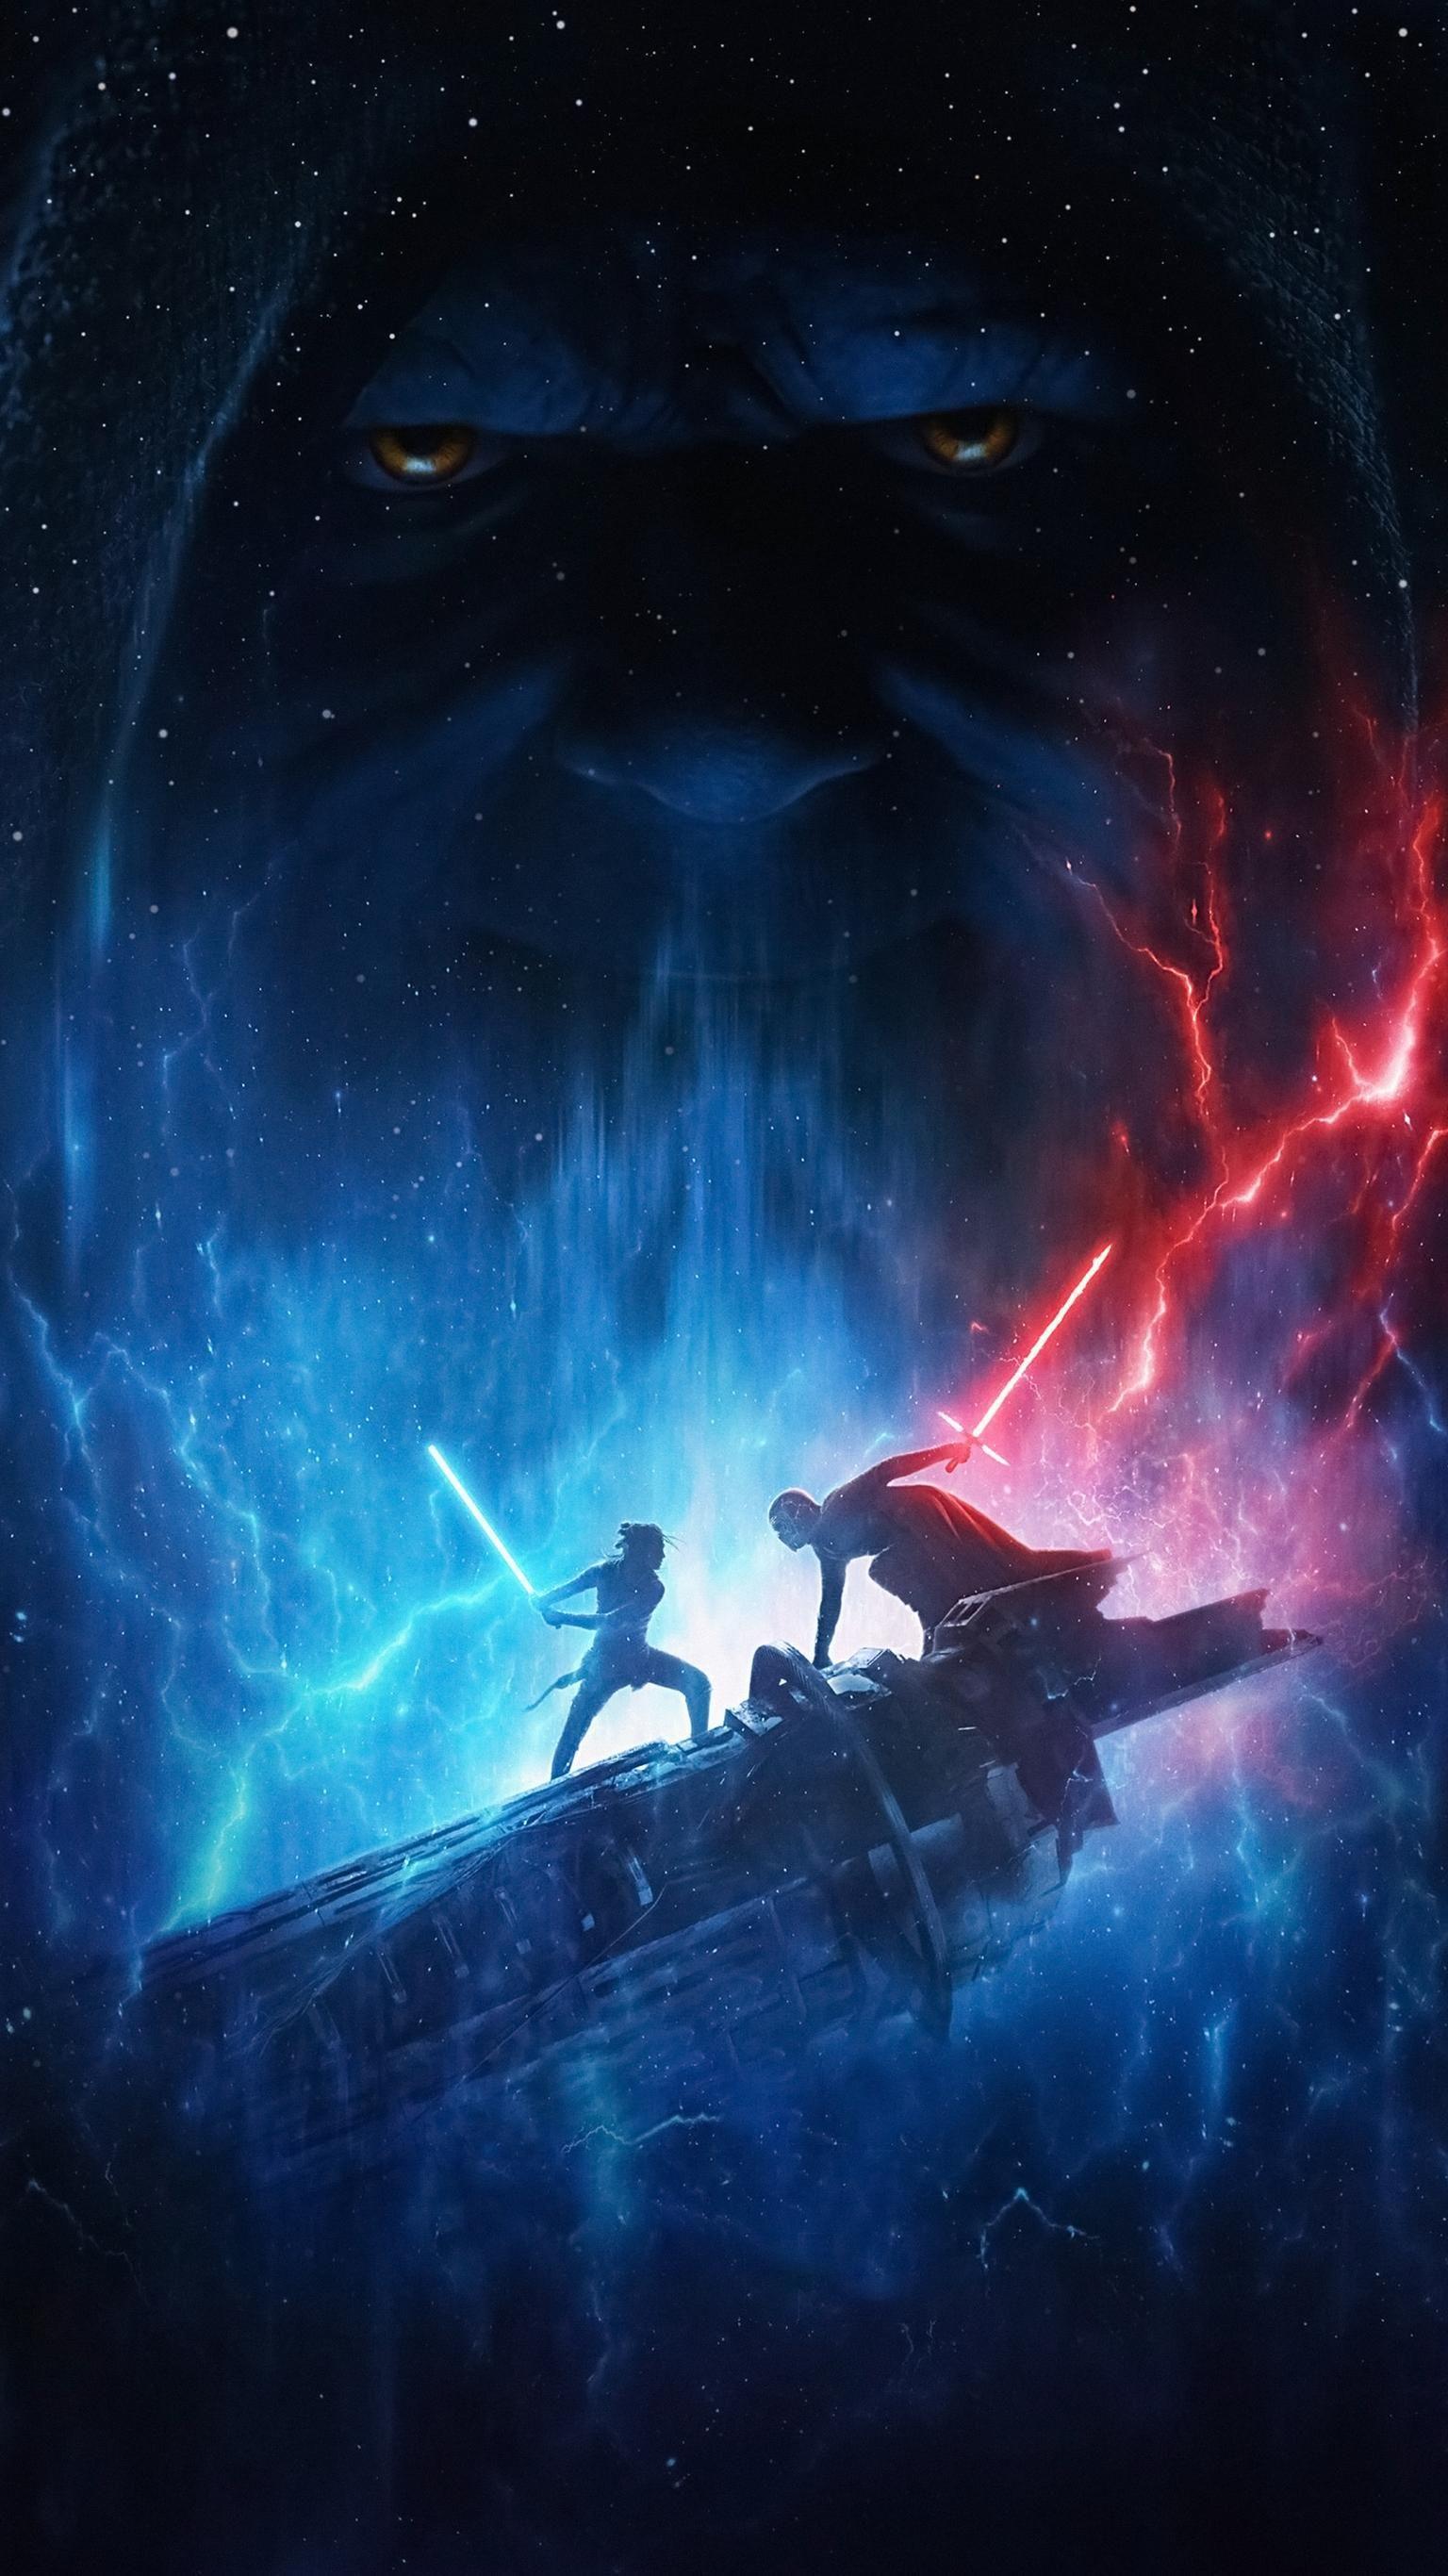 Star Wars Skywalker Art Wallpapers Wallpaper Cave